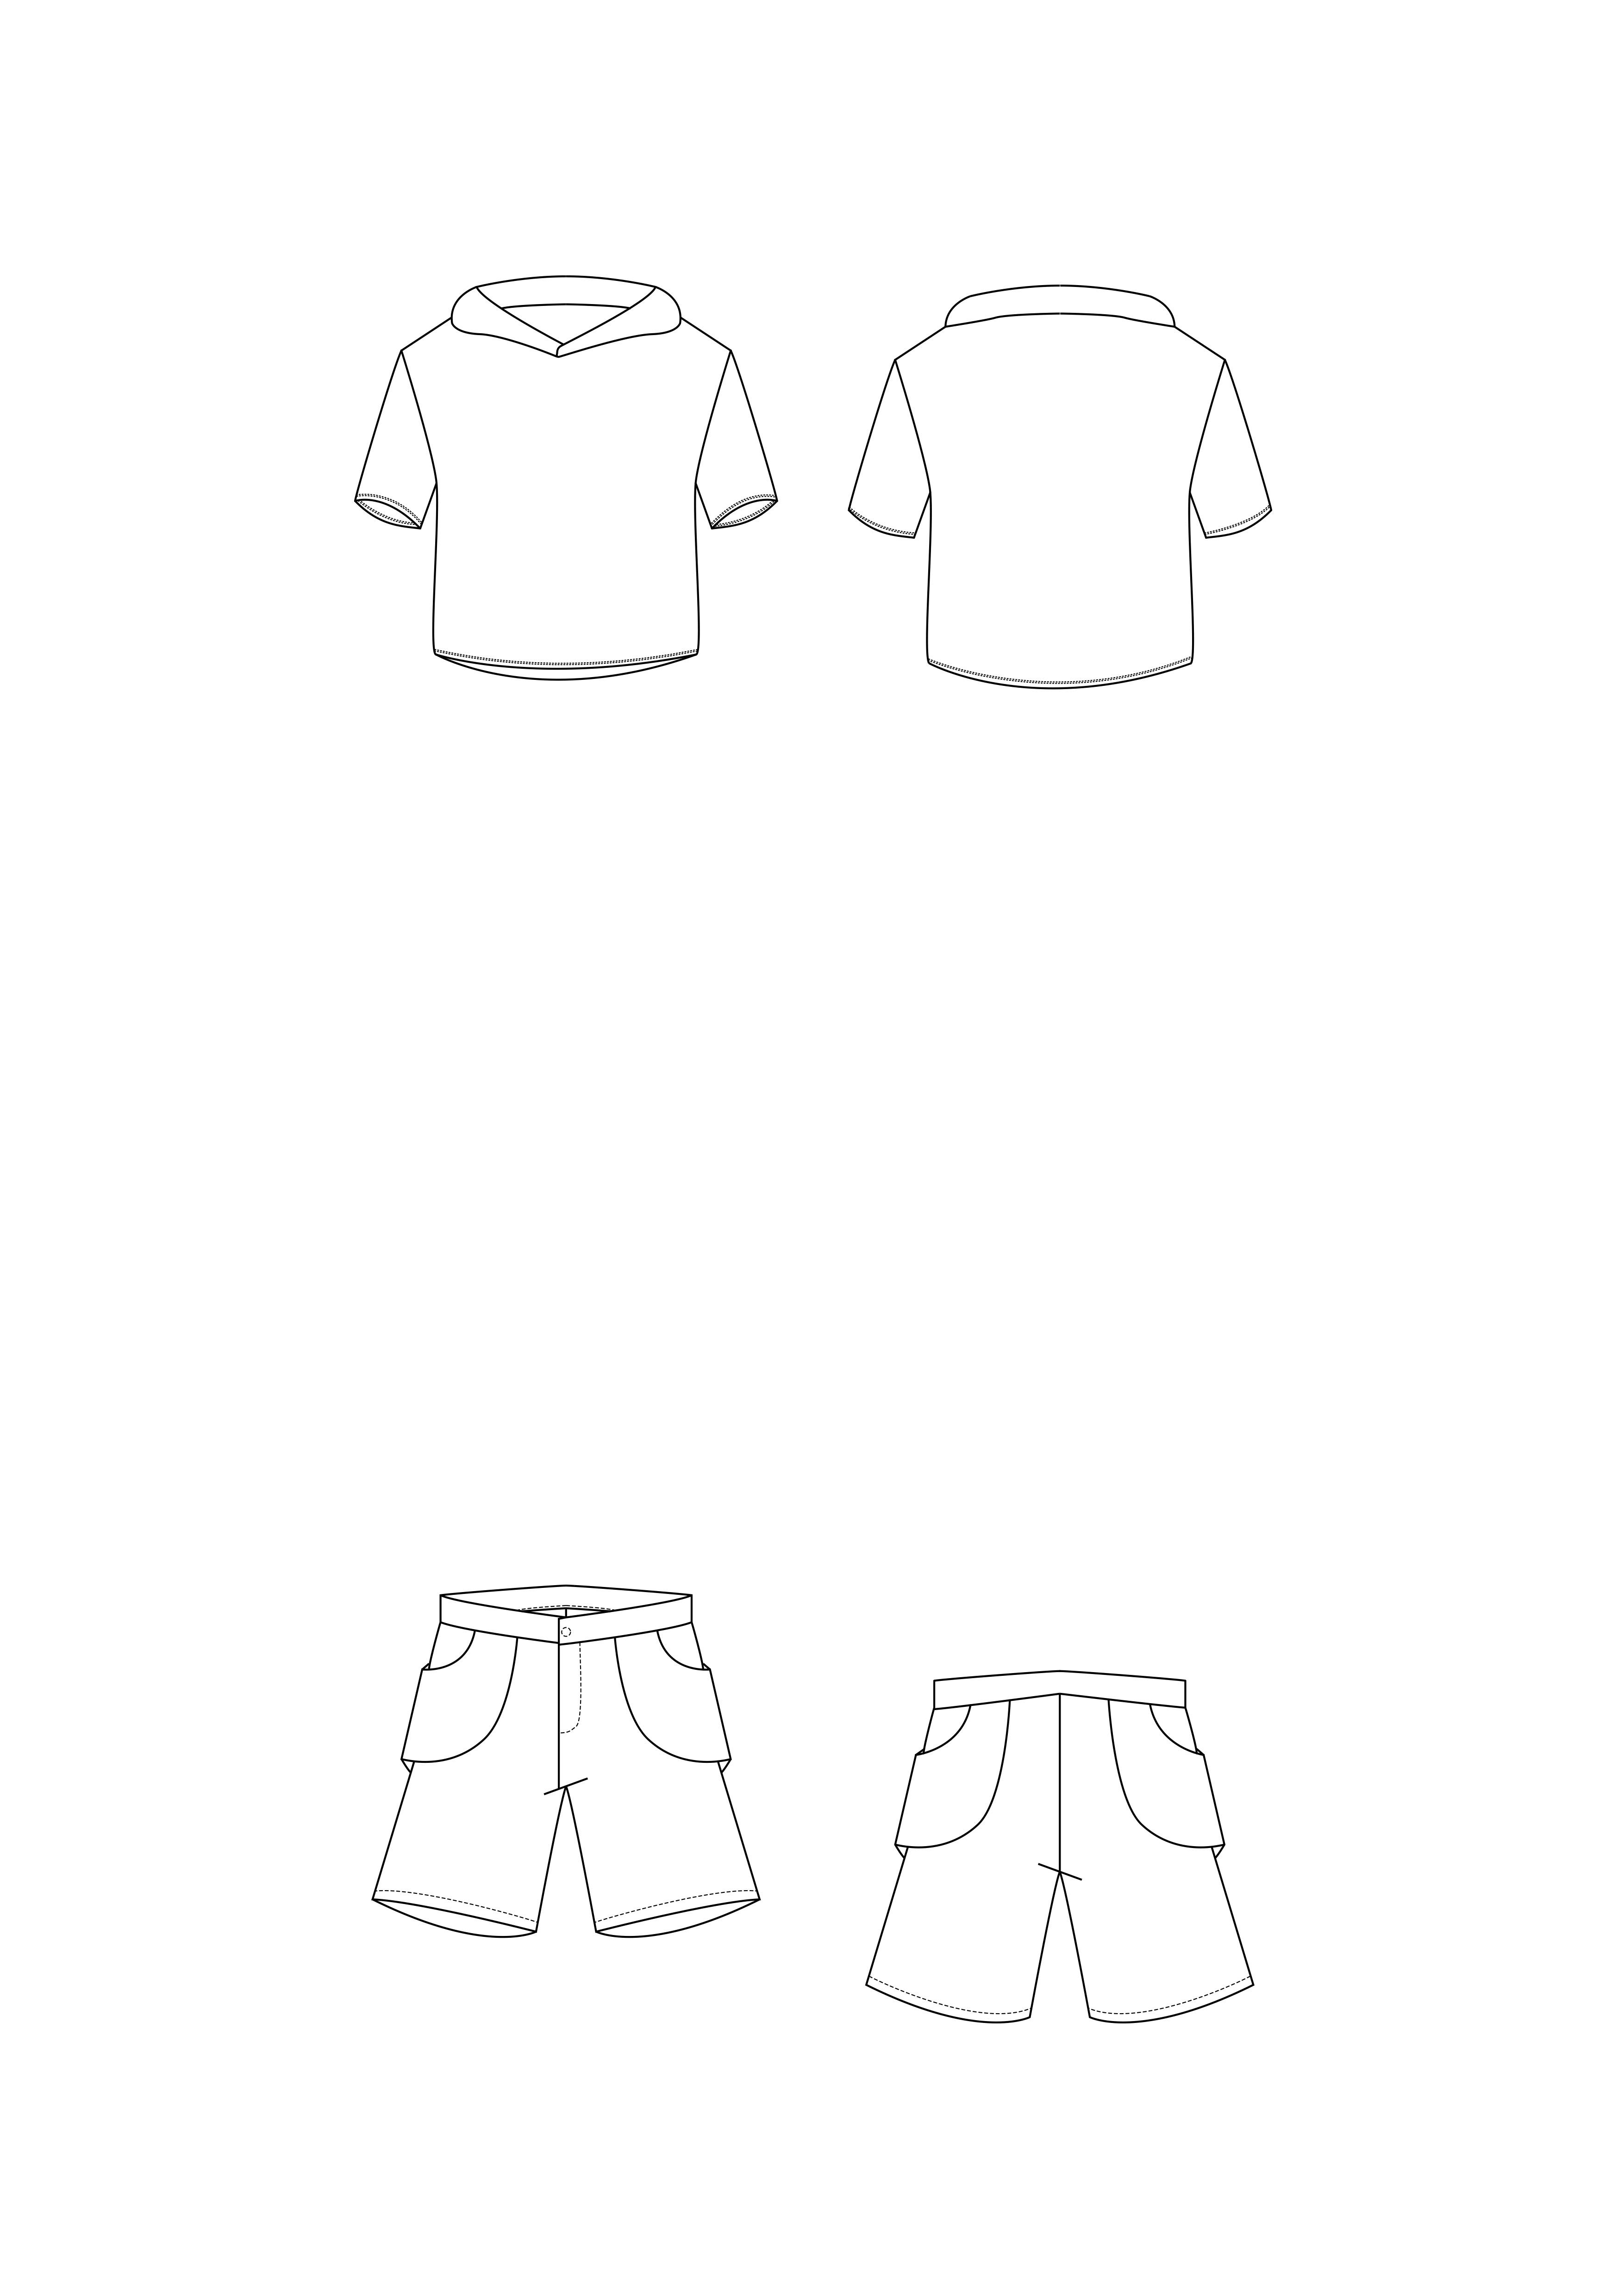 Flat illustrations